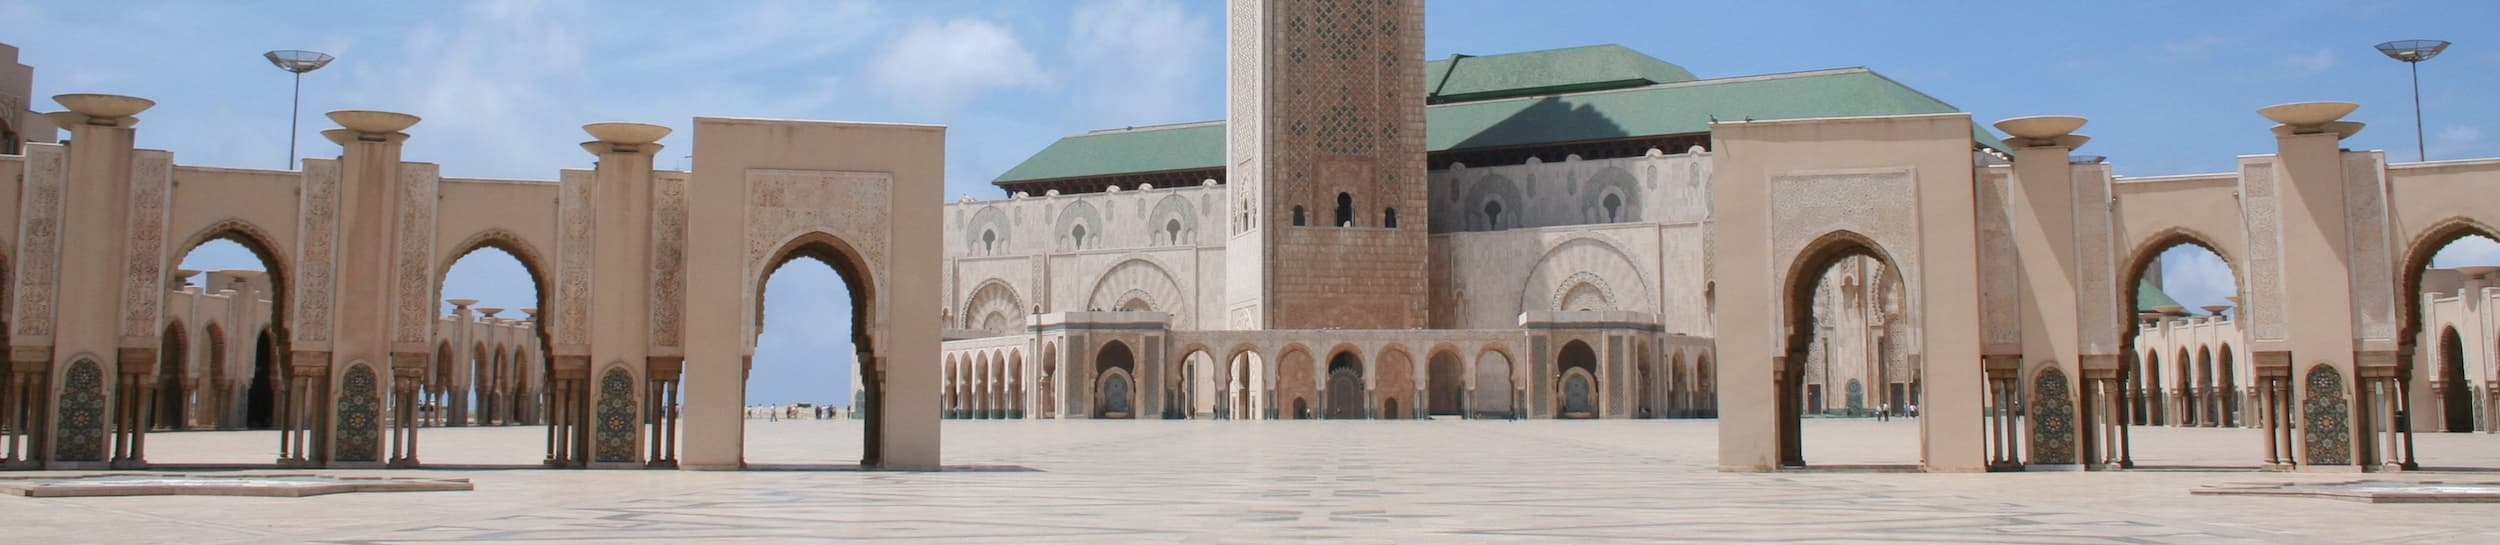 Jobs And Salaries In Casablanca Morocco